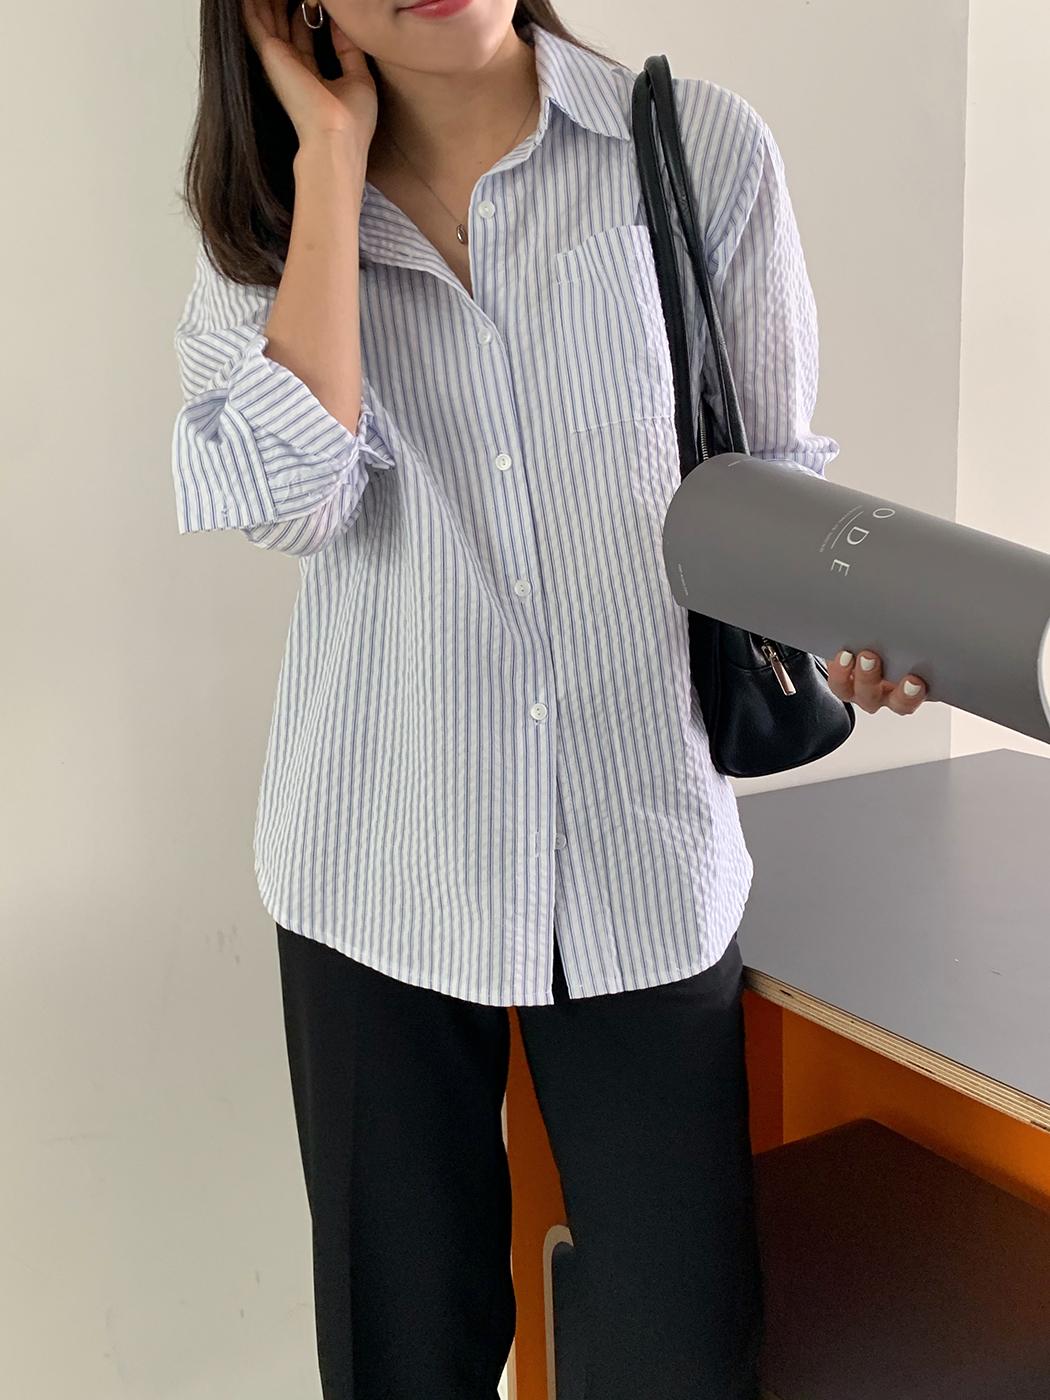 Moble seersucker striped shirt